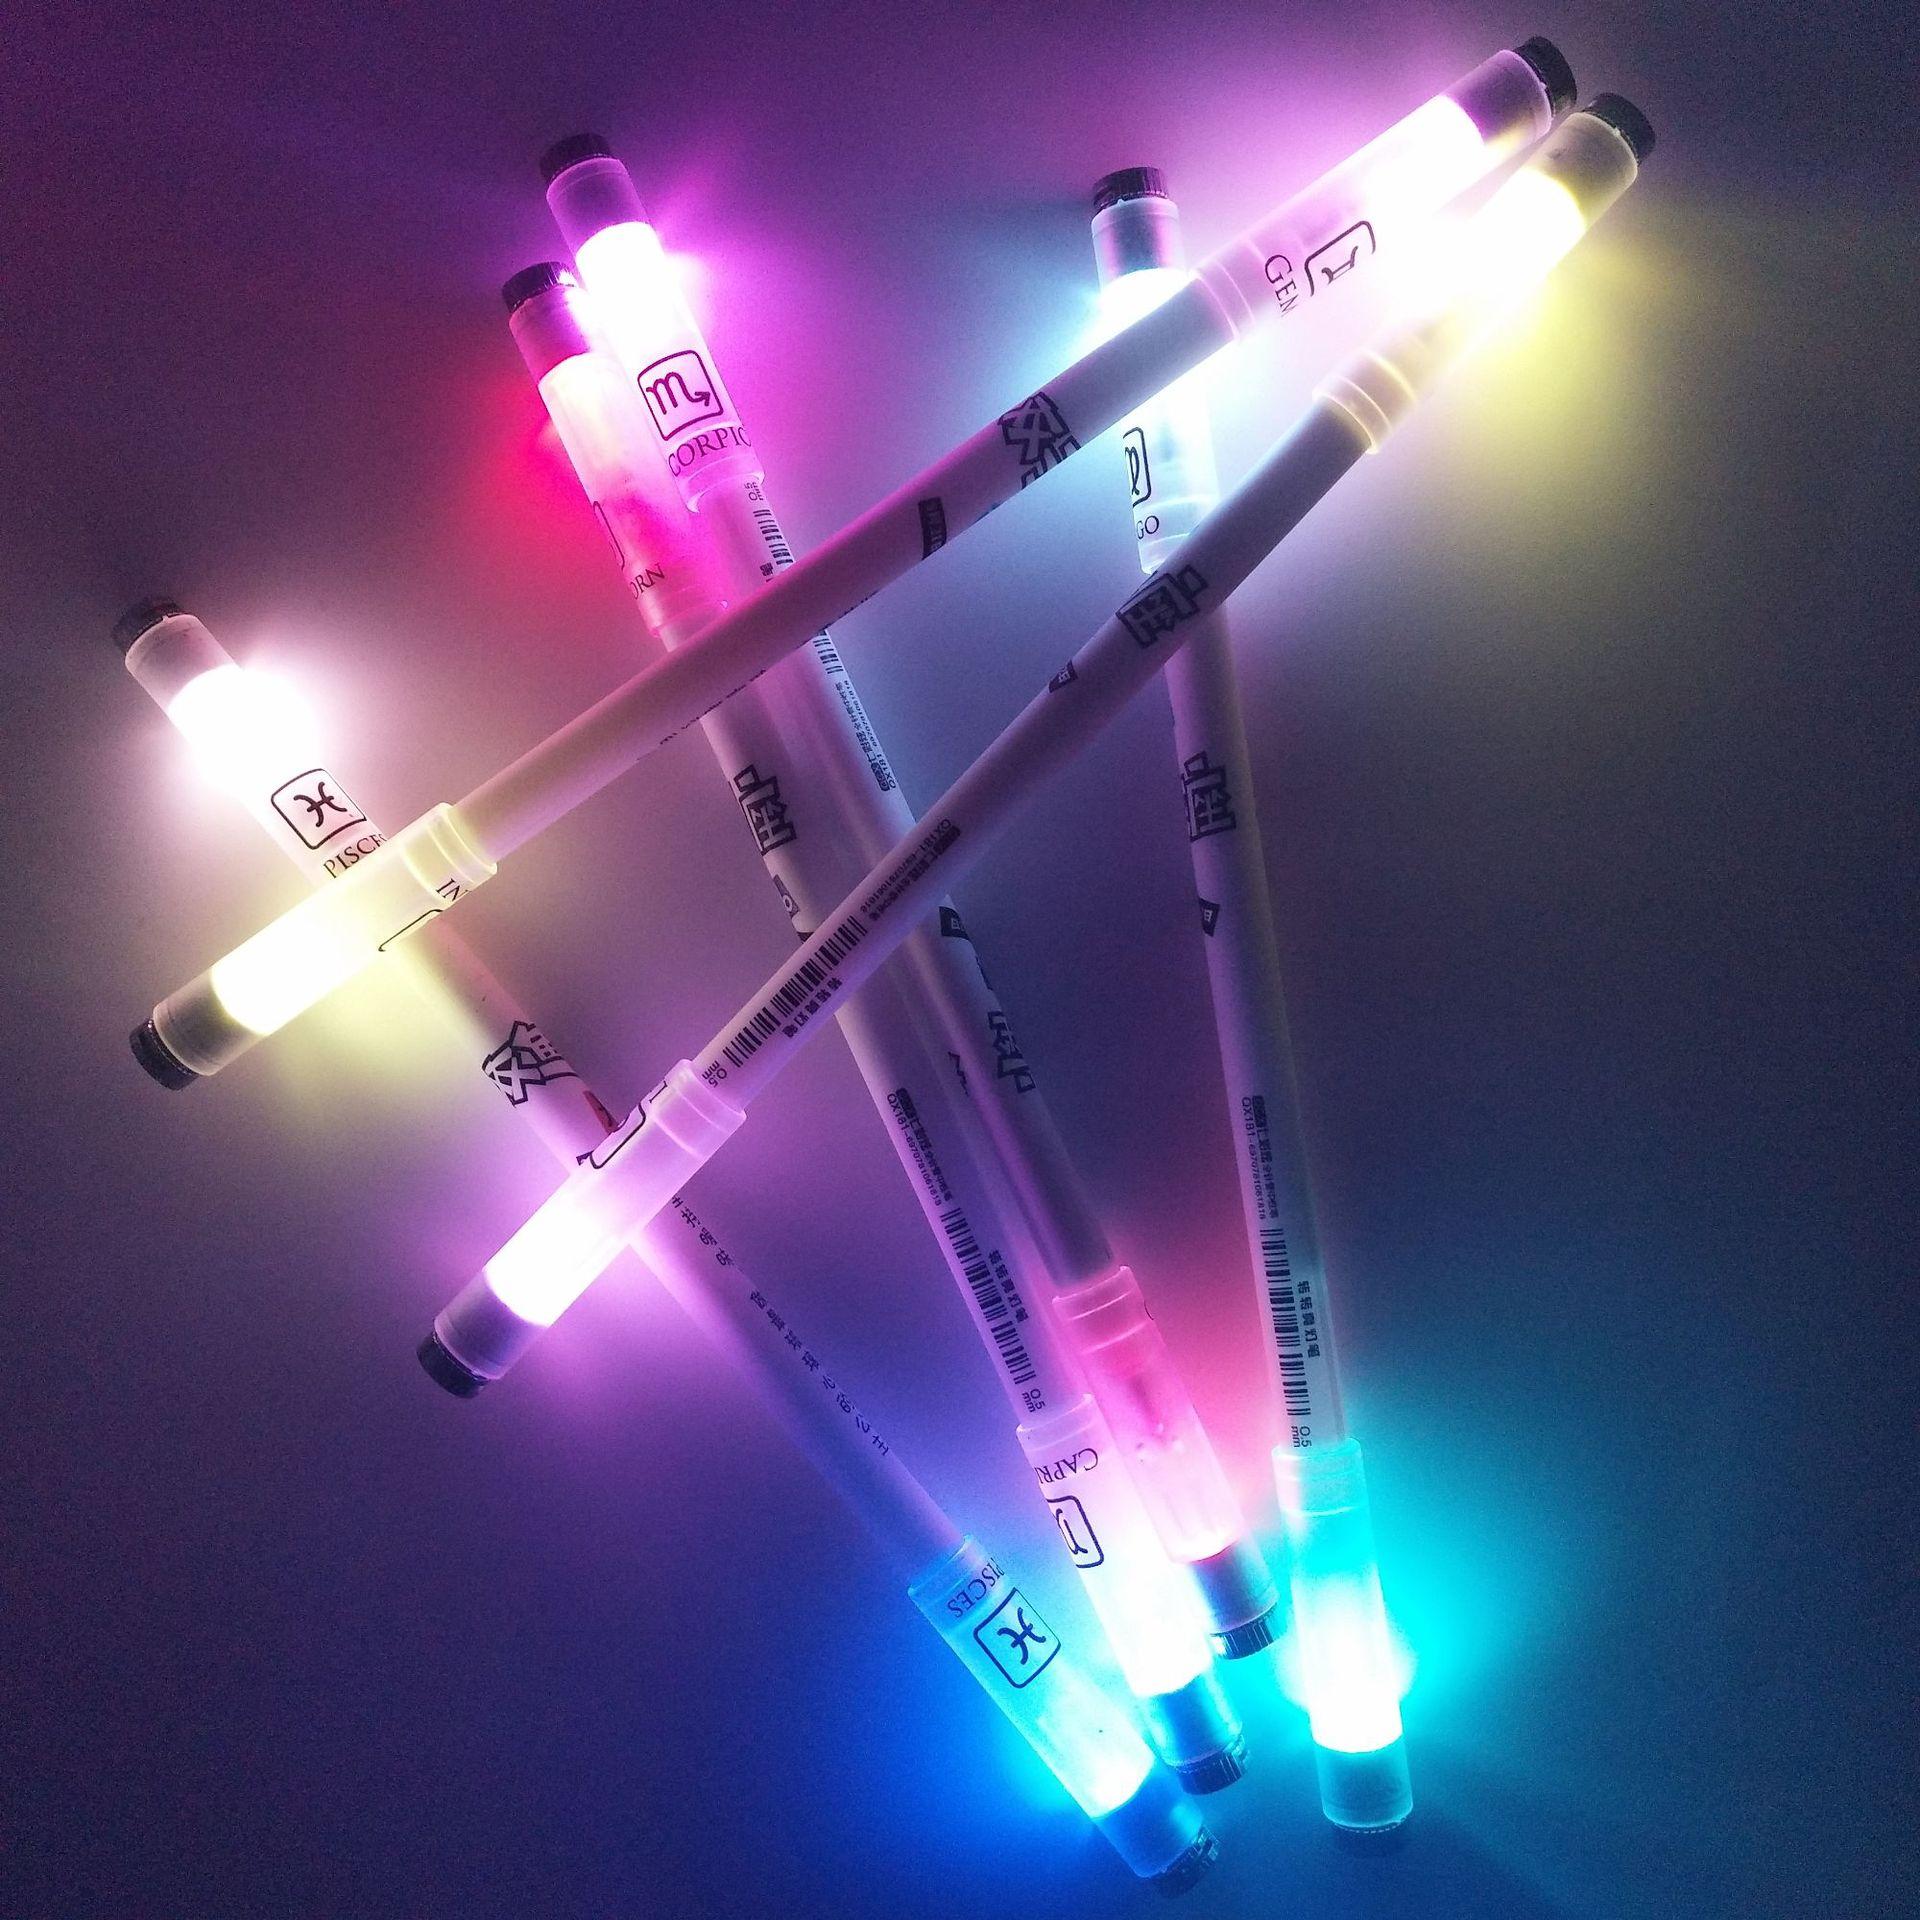 Twelve Constellation Pen Light Pen Colorful Lights Christmas Send Friends Gel Pen Twelve Constellations Colorful Lights Rotating